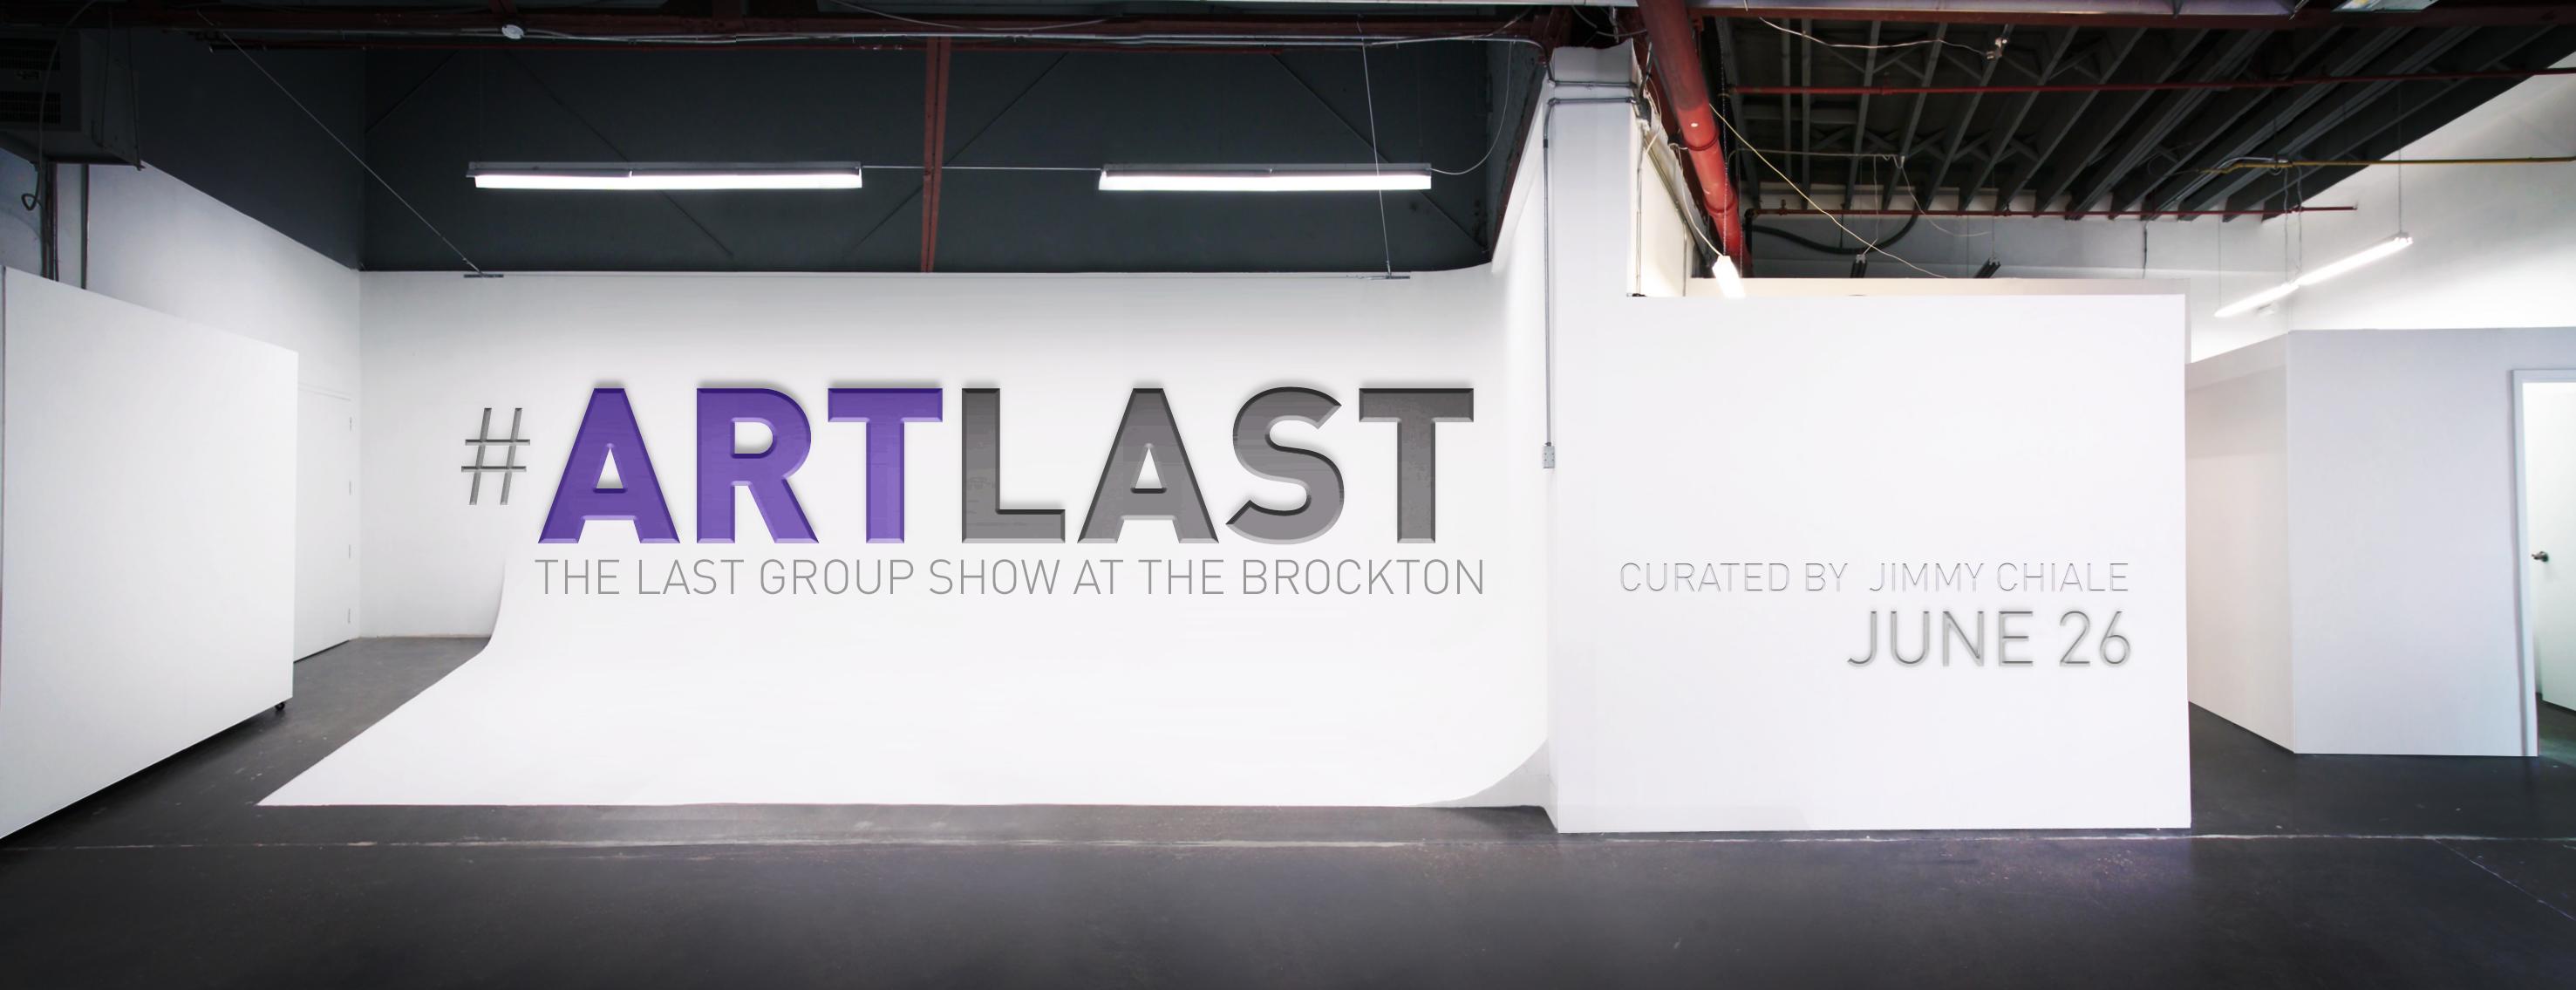 Brockton Presents: #ARTLAST